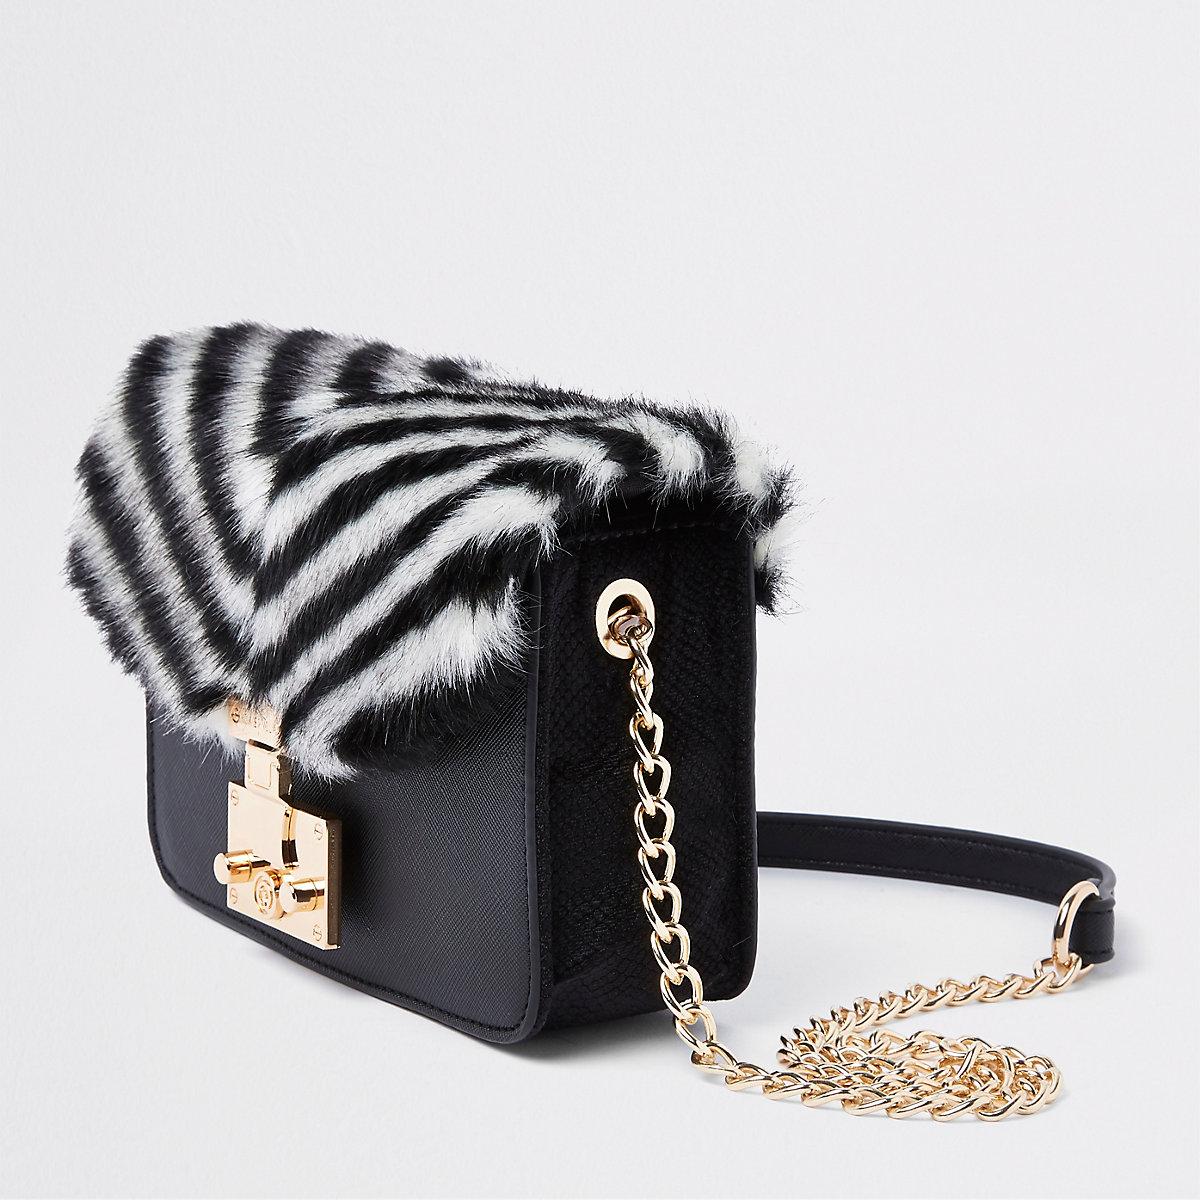 66582bda1d2b Black faux fur stripe cross body bag - Cross Body Bags - Bags   Purses -  women